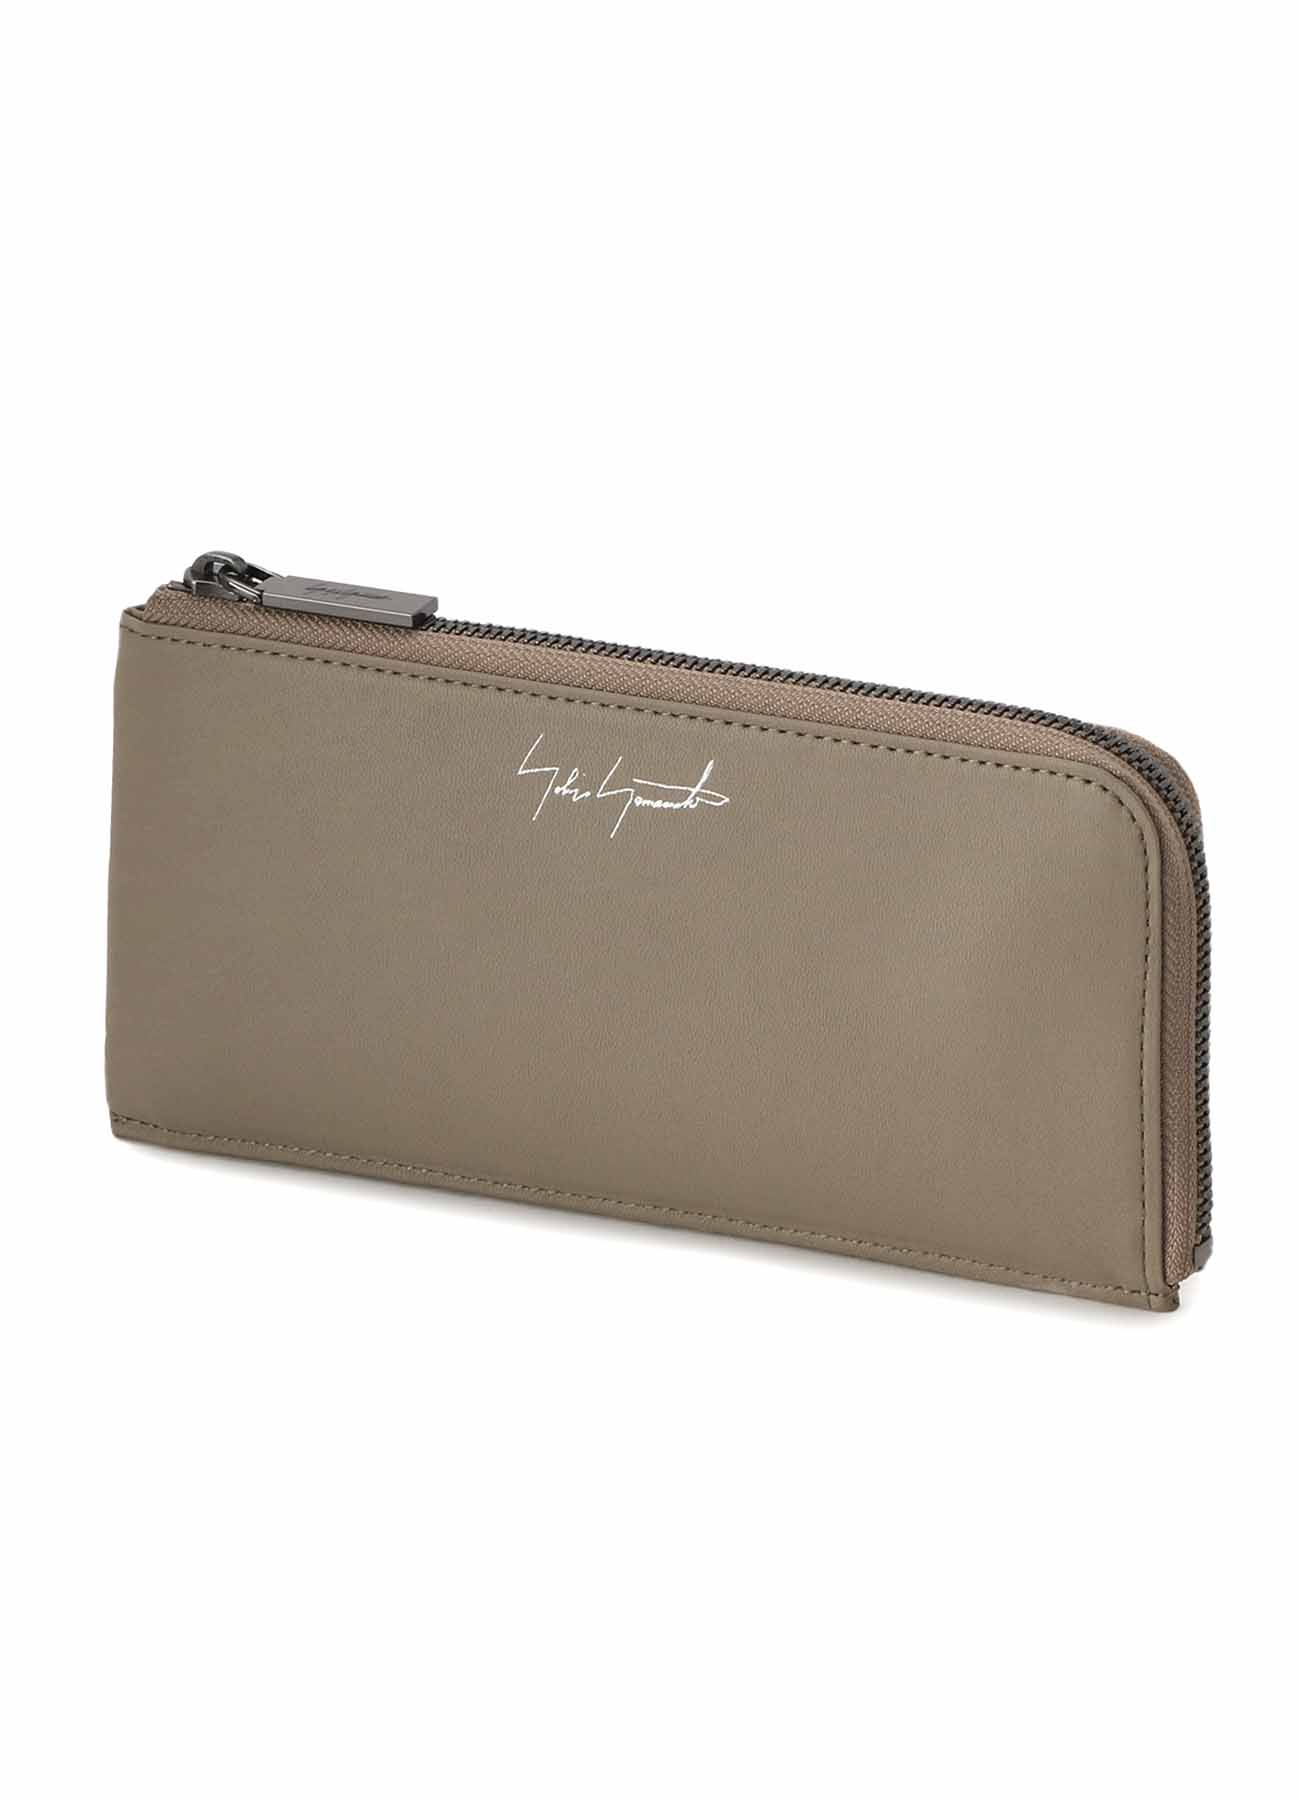 Plain(long wallet)